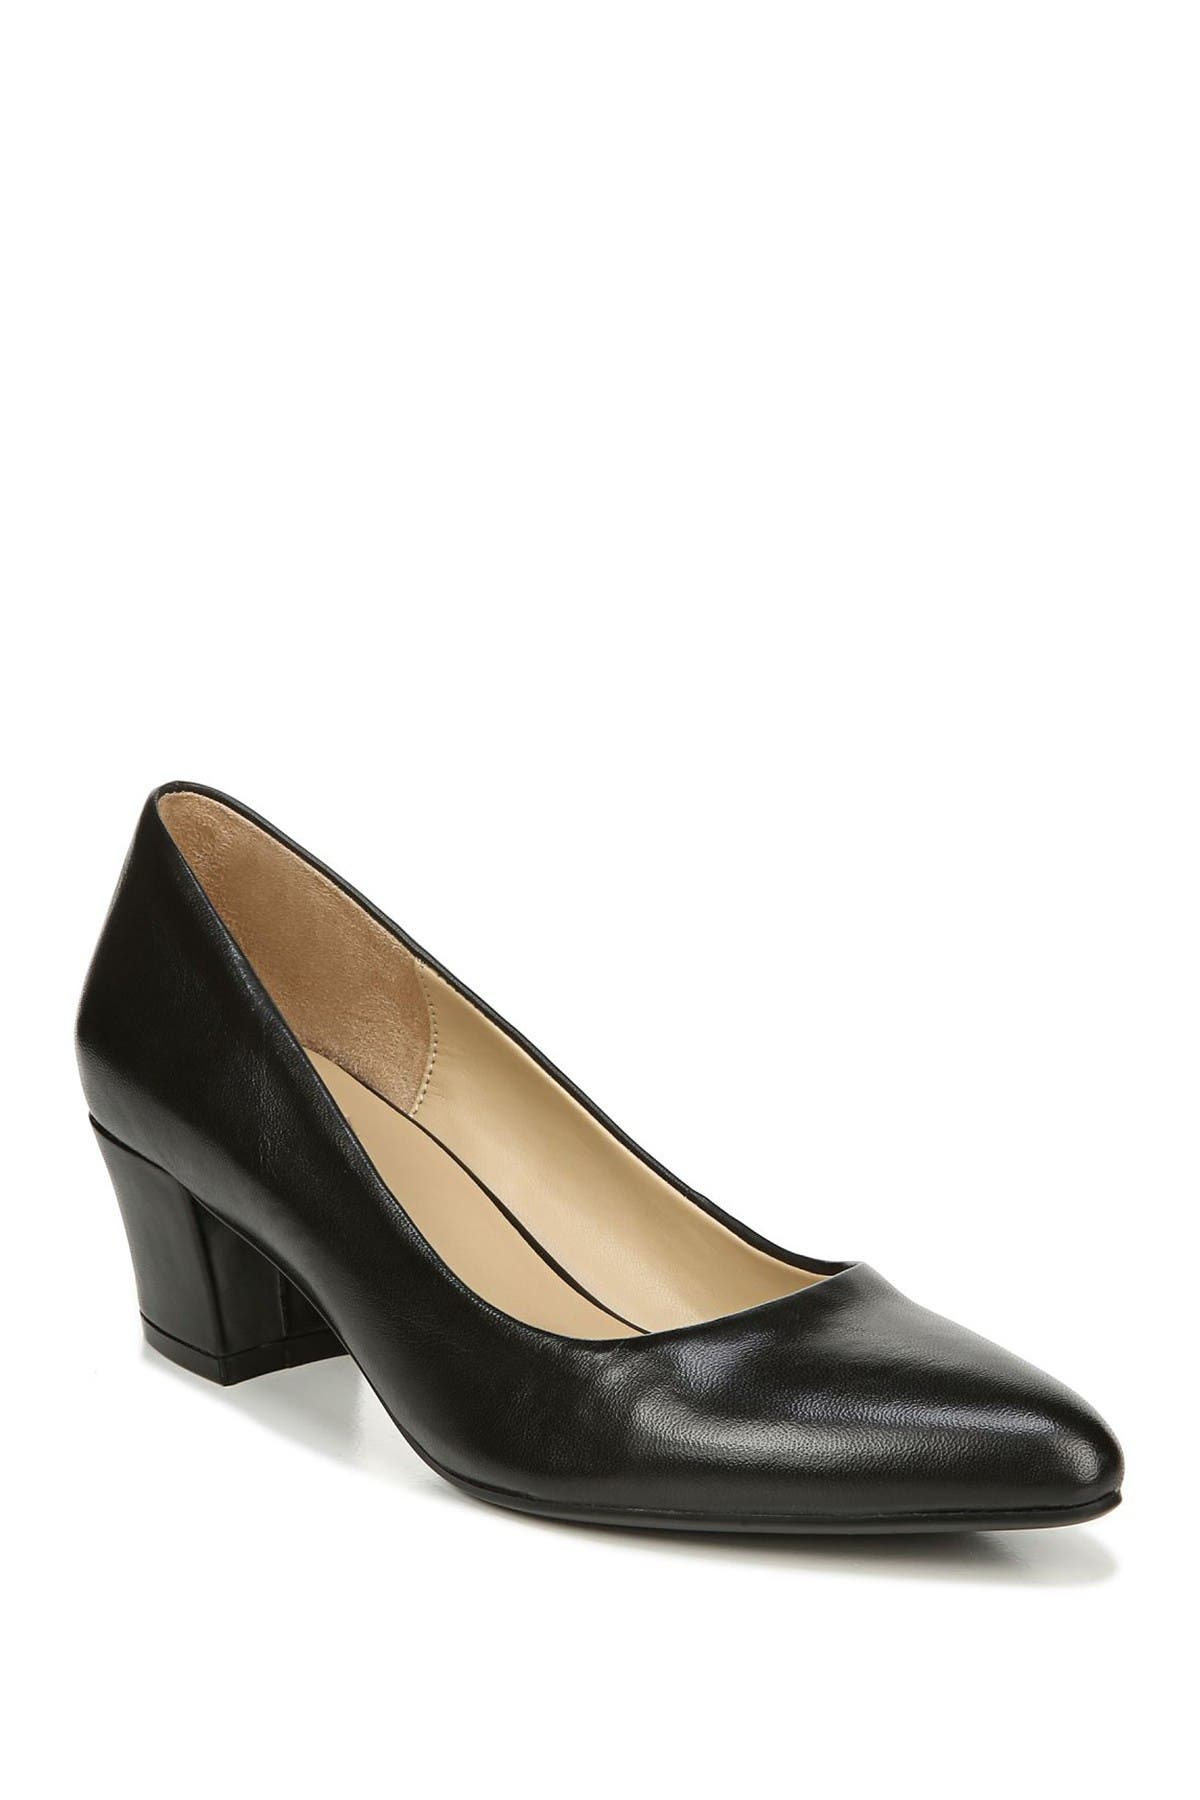 Naturalizer | Carmen Leather Block Heel